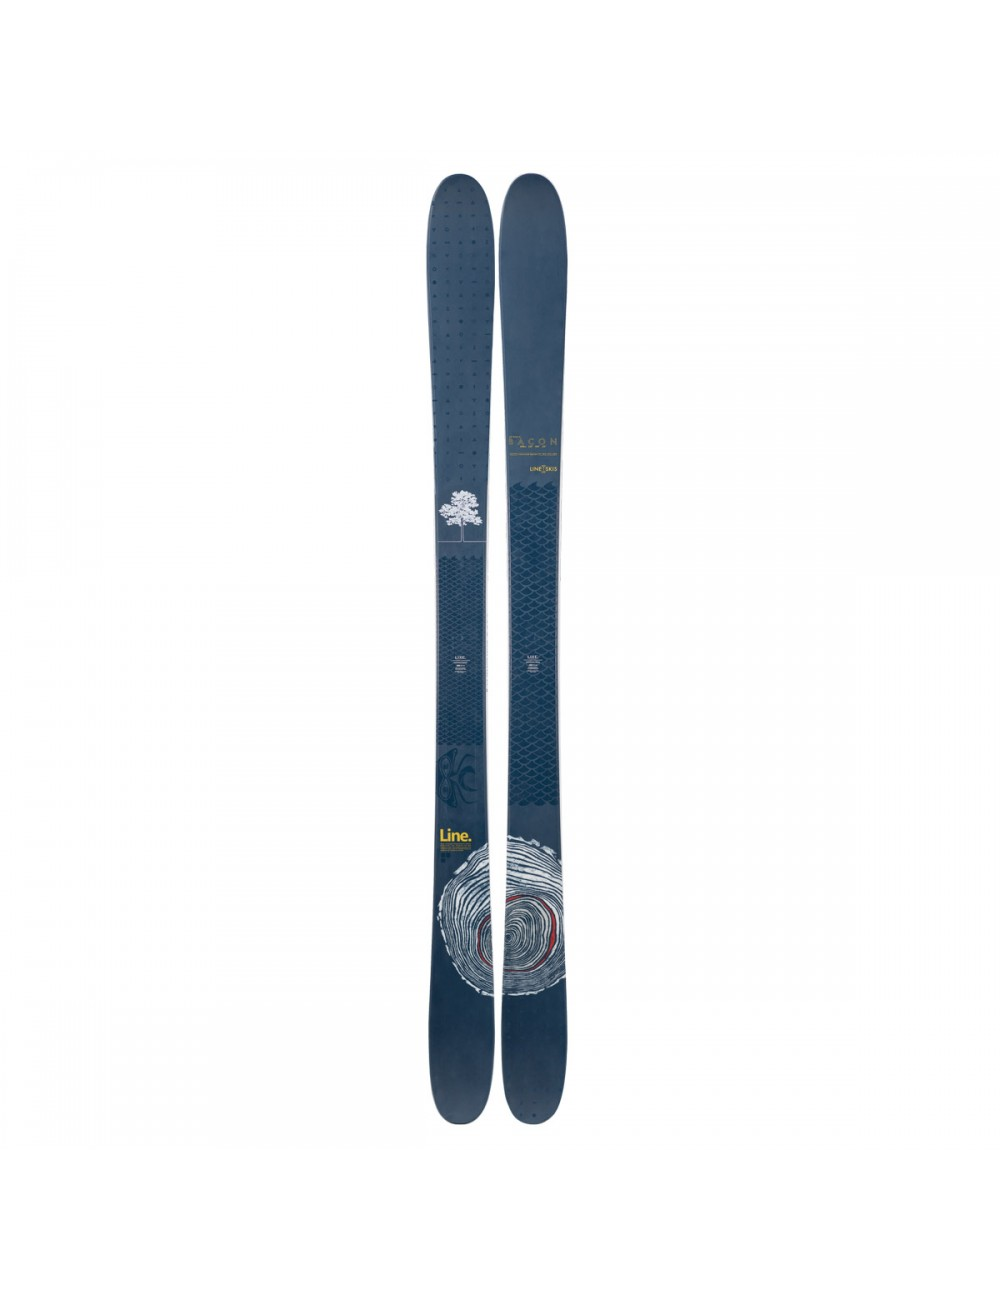 Line Sir Fancis Bacon Ski_1000192